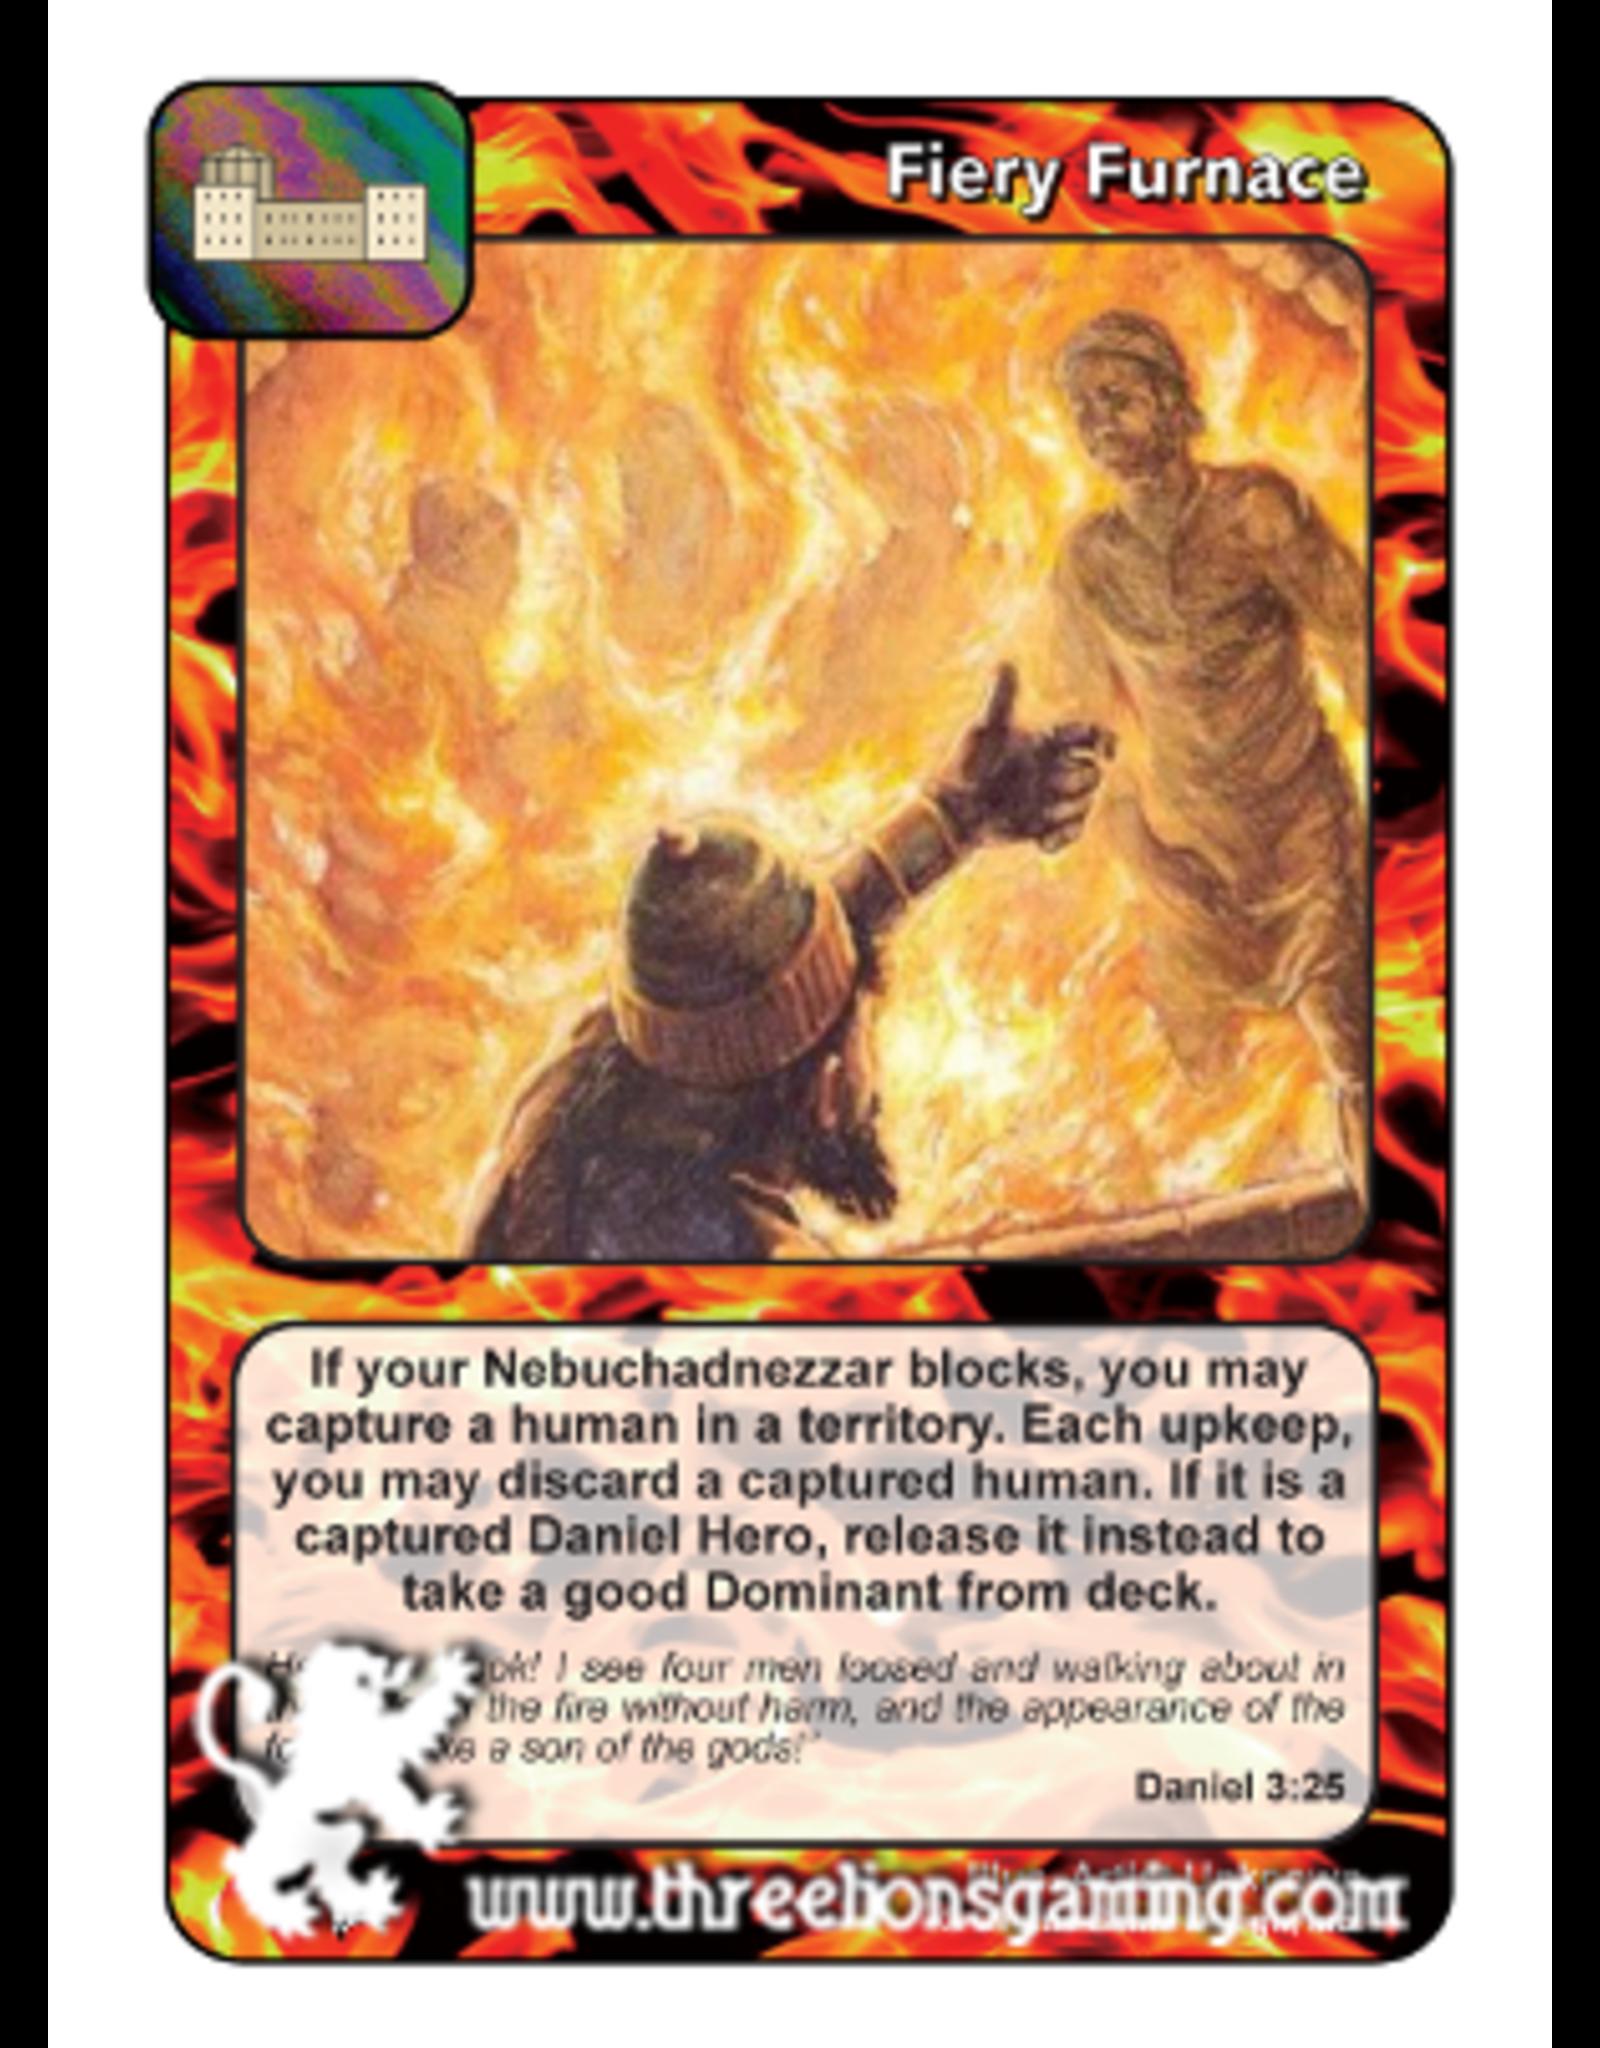 PoC: Fiery Furnace